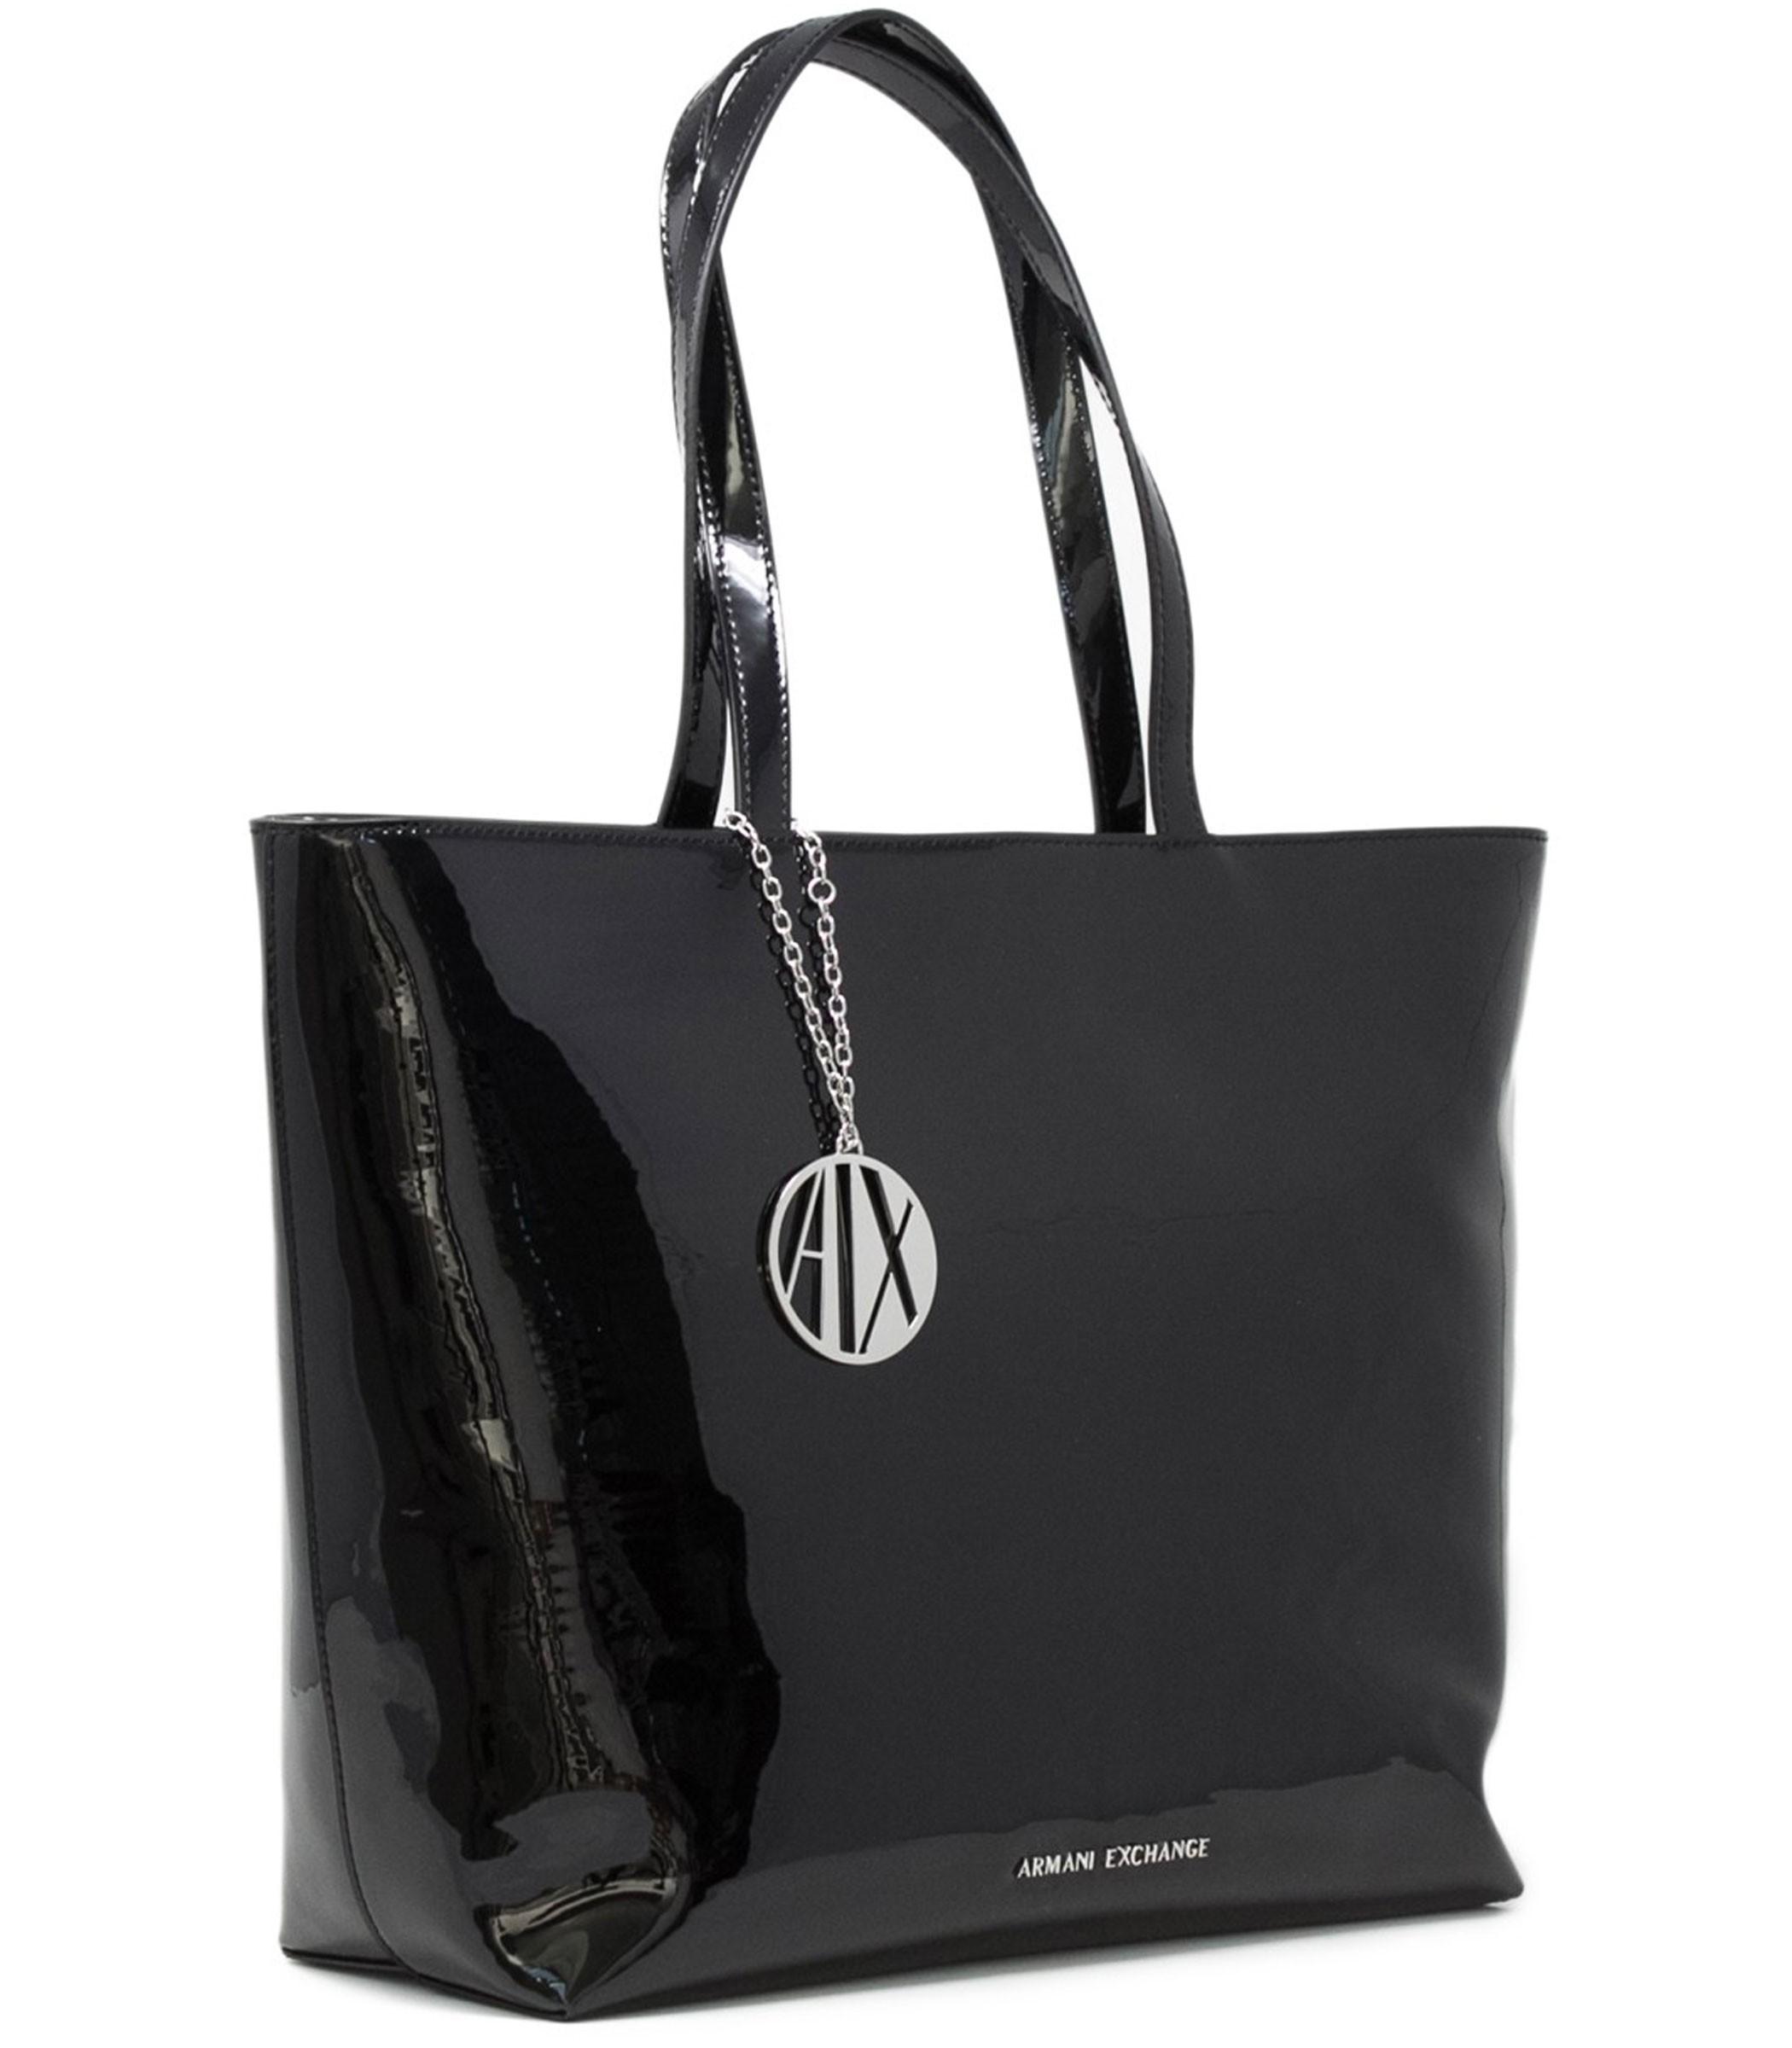 9b55bc9bc4 942426 CC713 Borsa Armani Exchange Shopping Bag in vernice da donna rif.